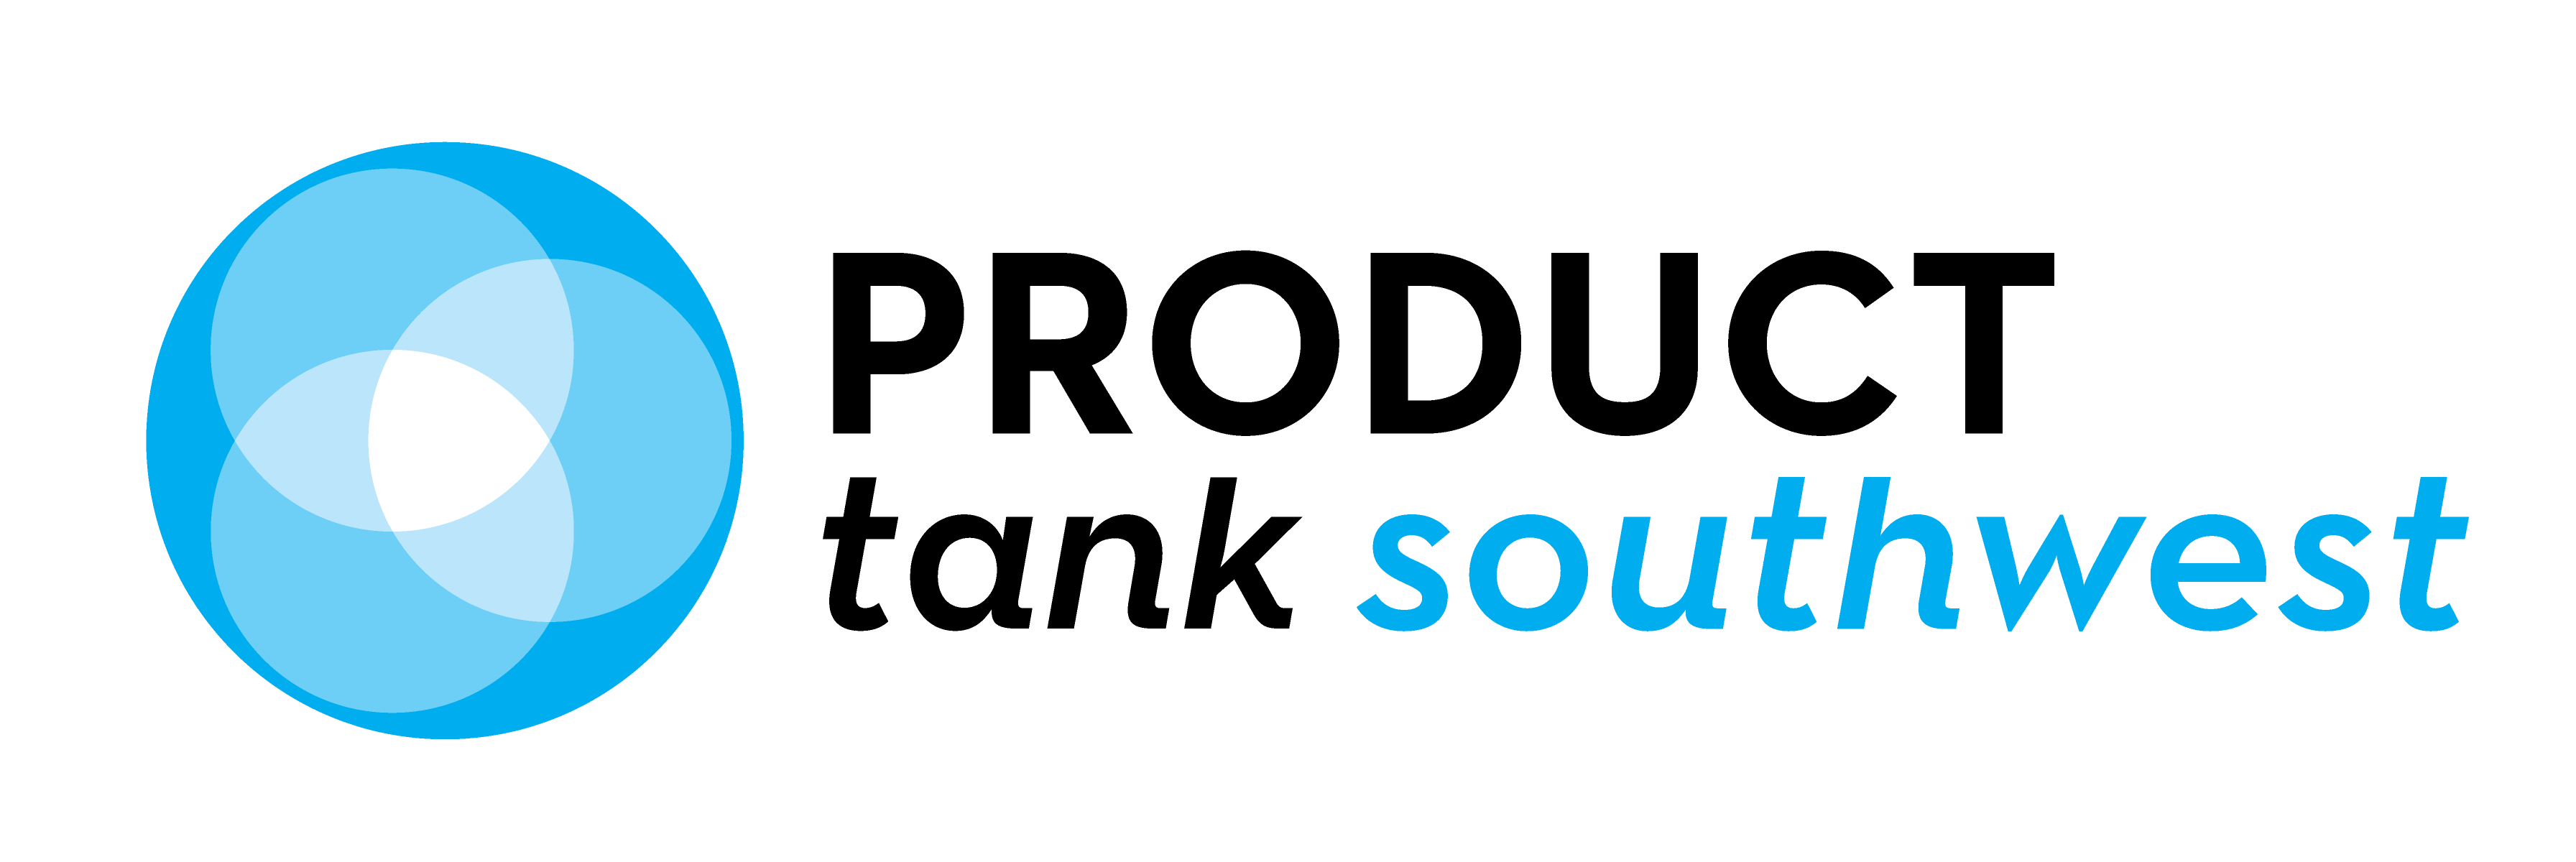 Product Tank SW logo